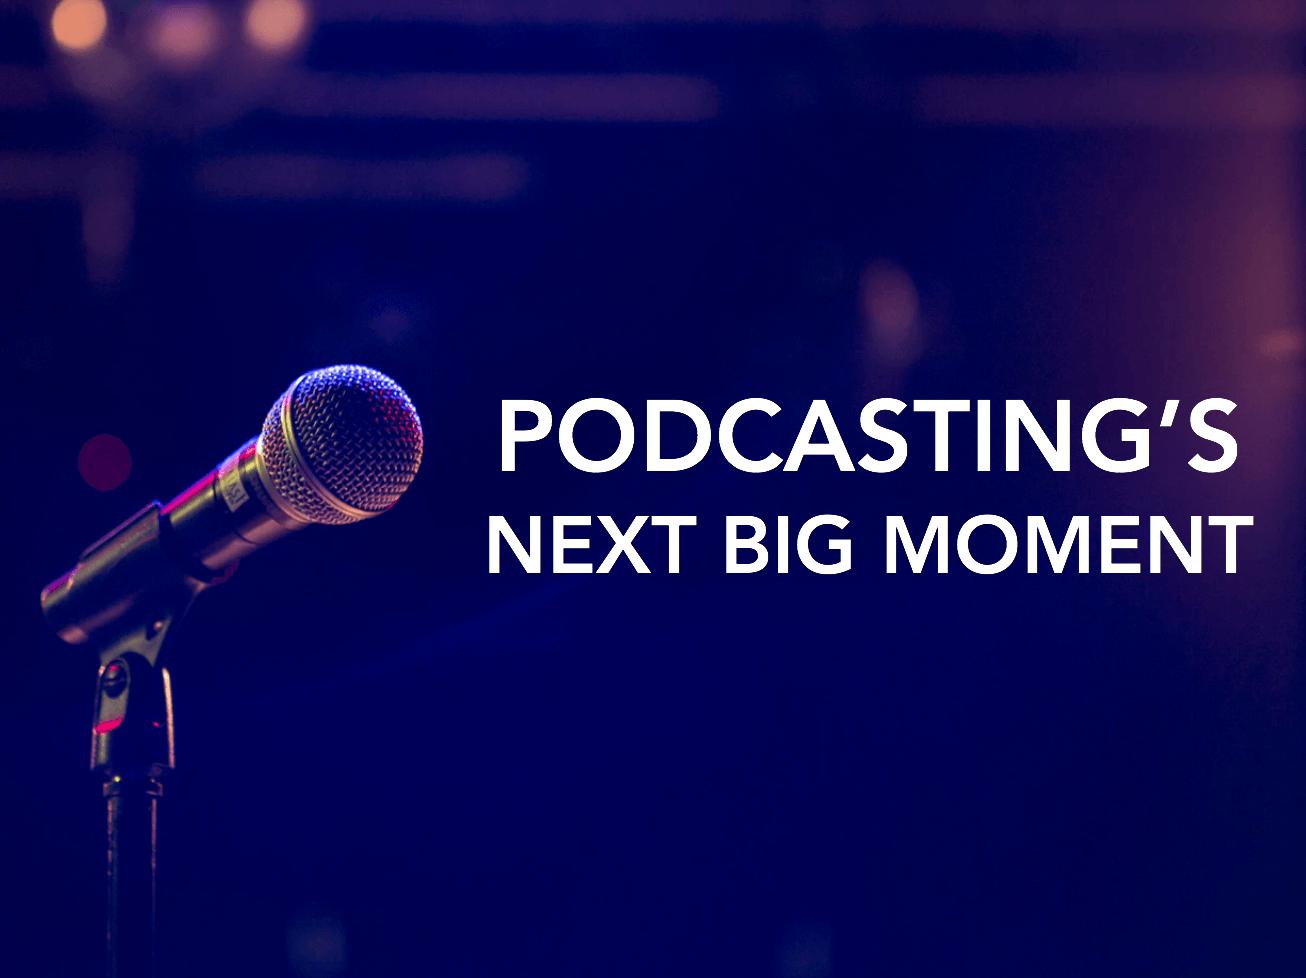 podcasting's next big moment